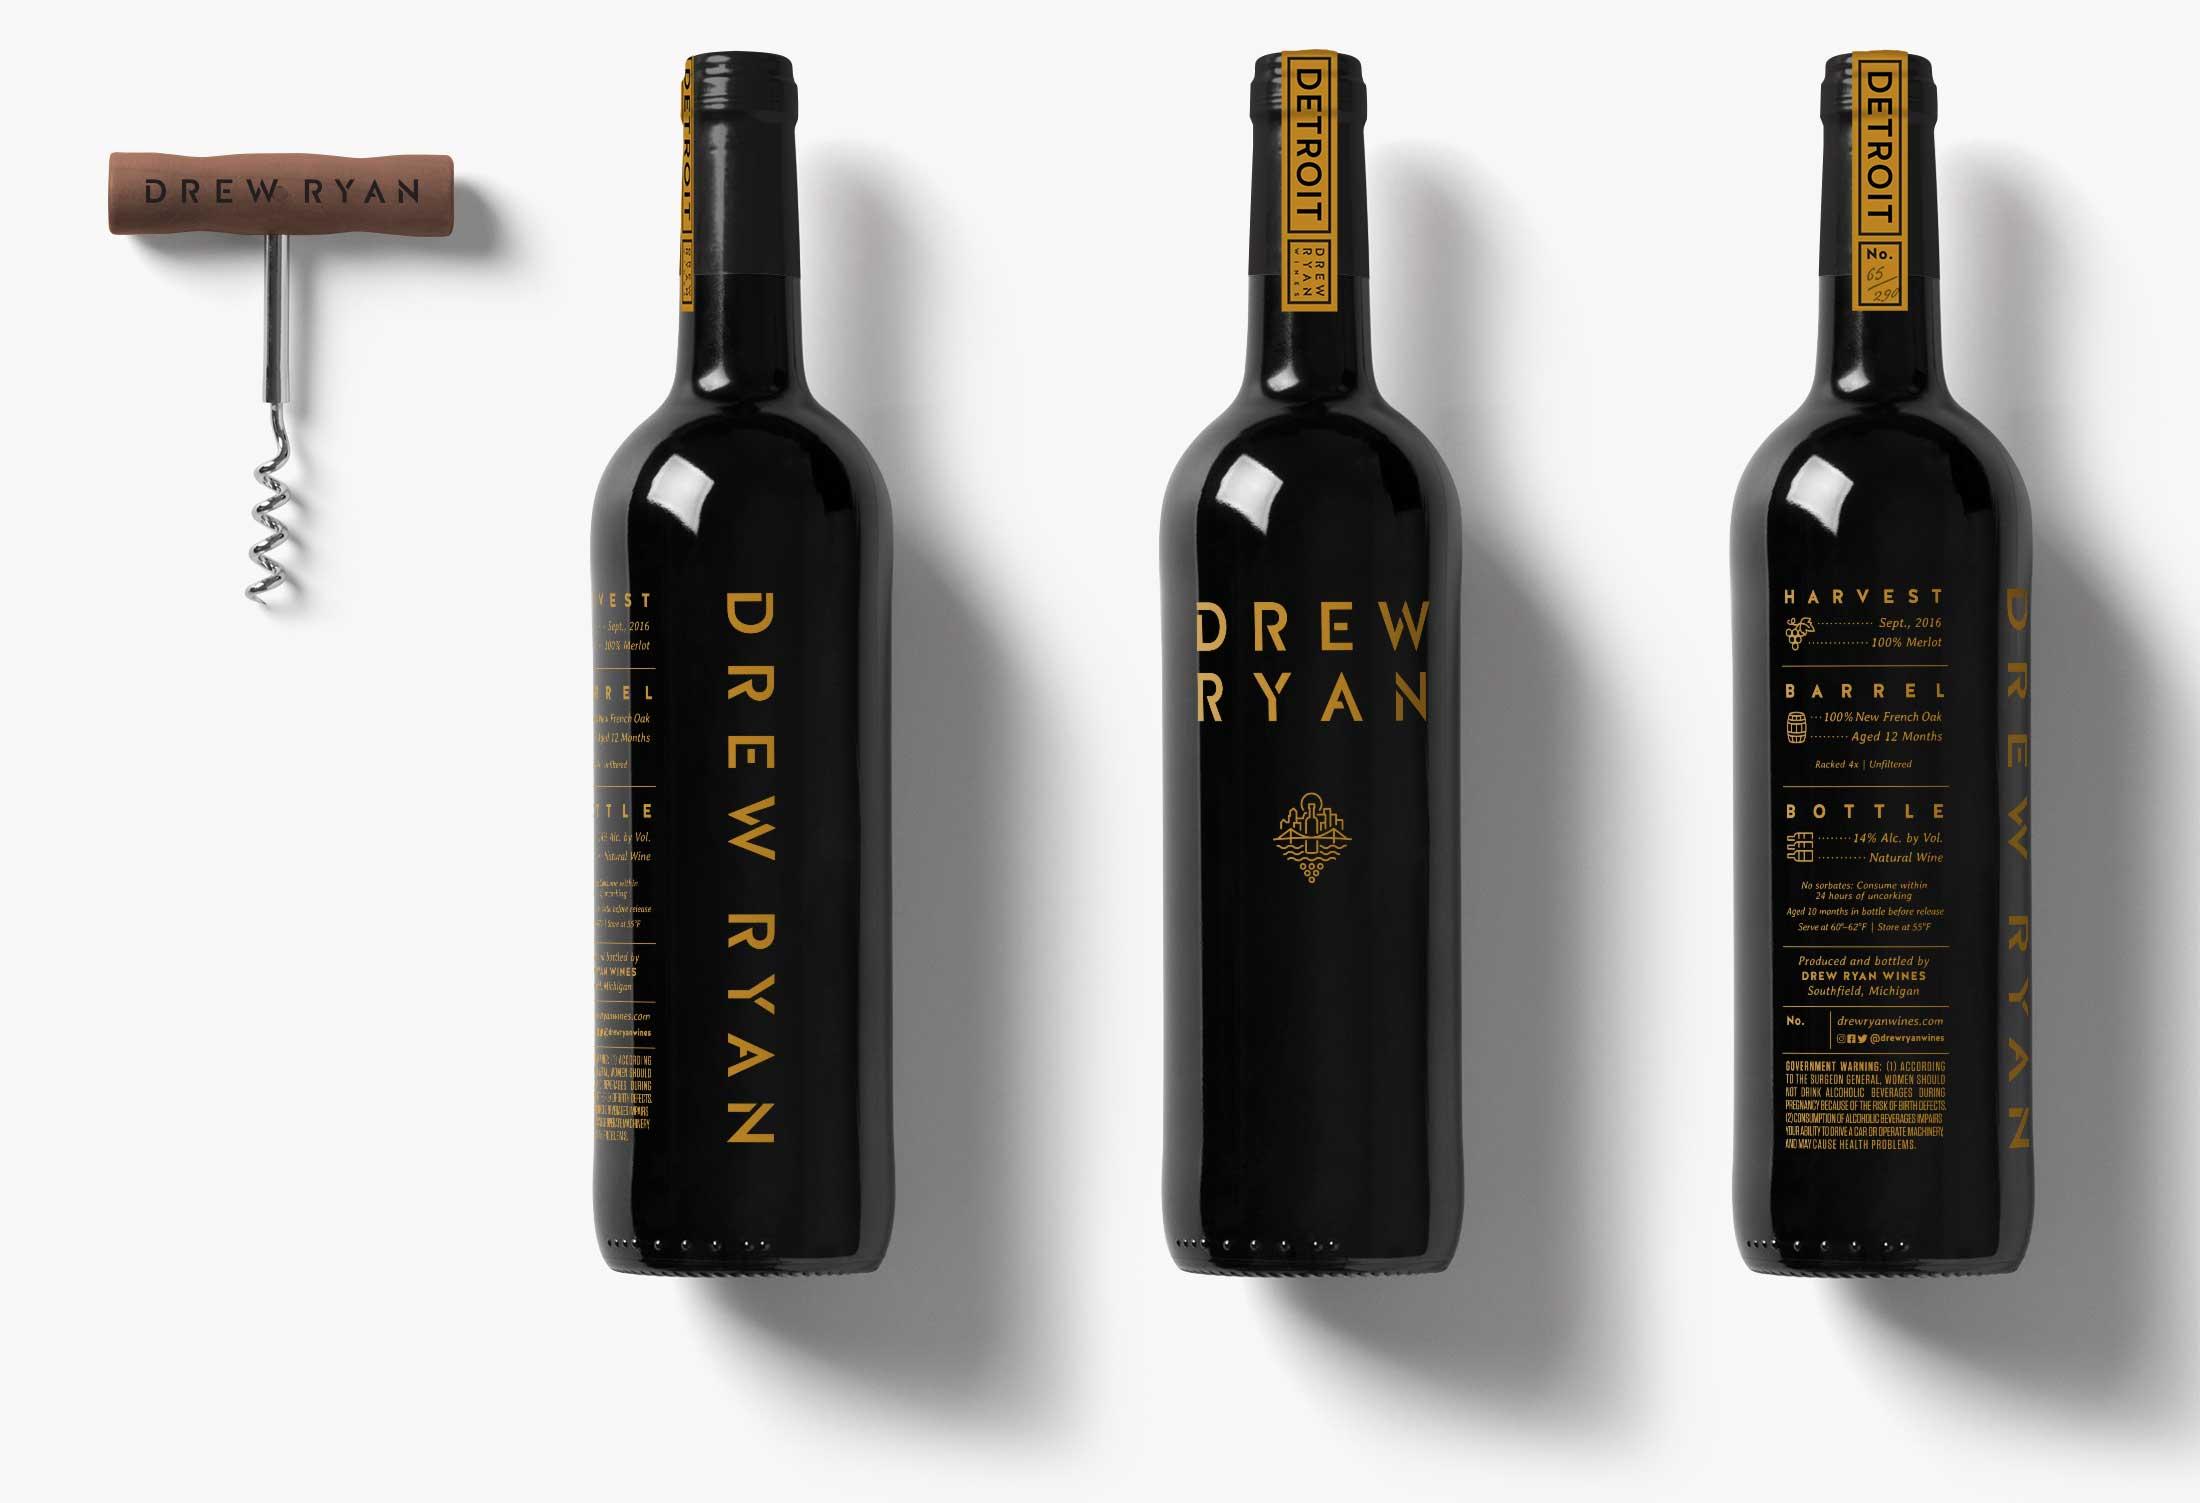 Wine-Branding_Ebbing_Drew-Ryan-Wine-Bottle-Label-Design-All-Sides.jpg